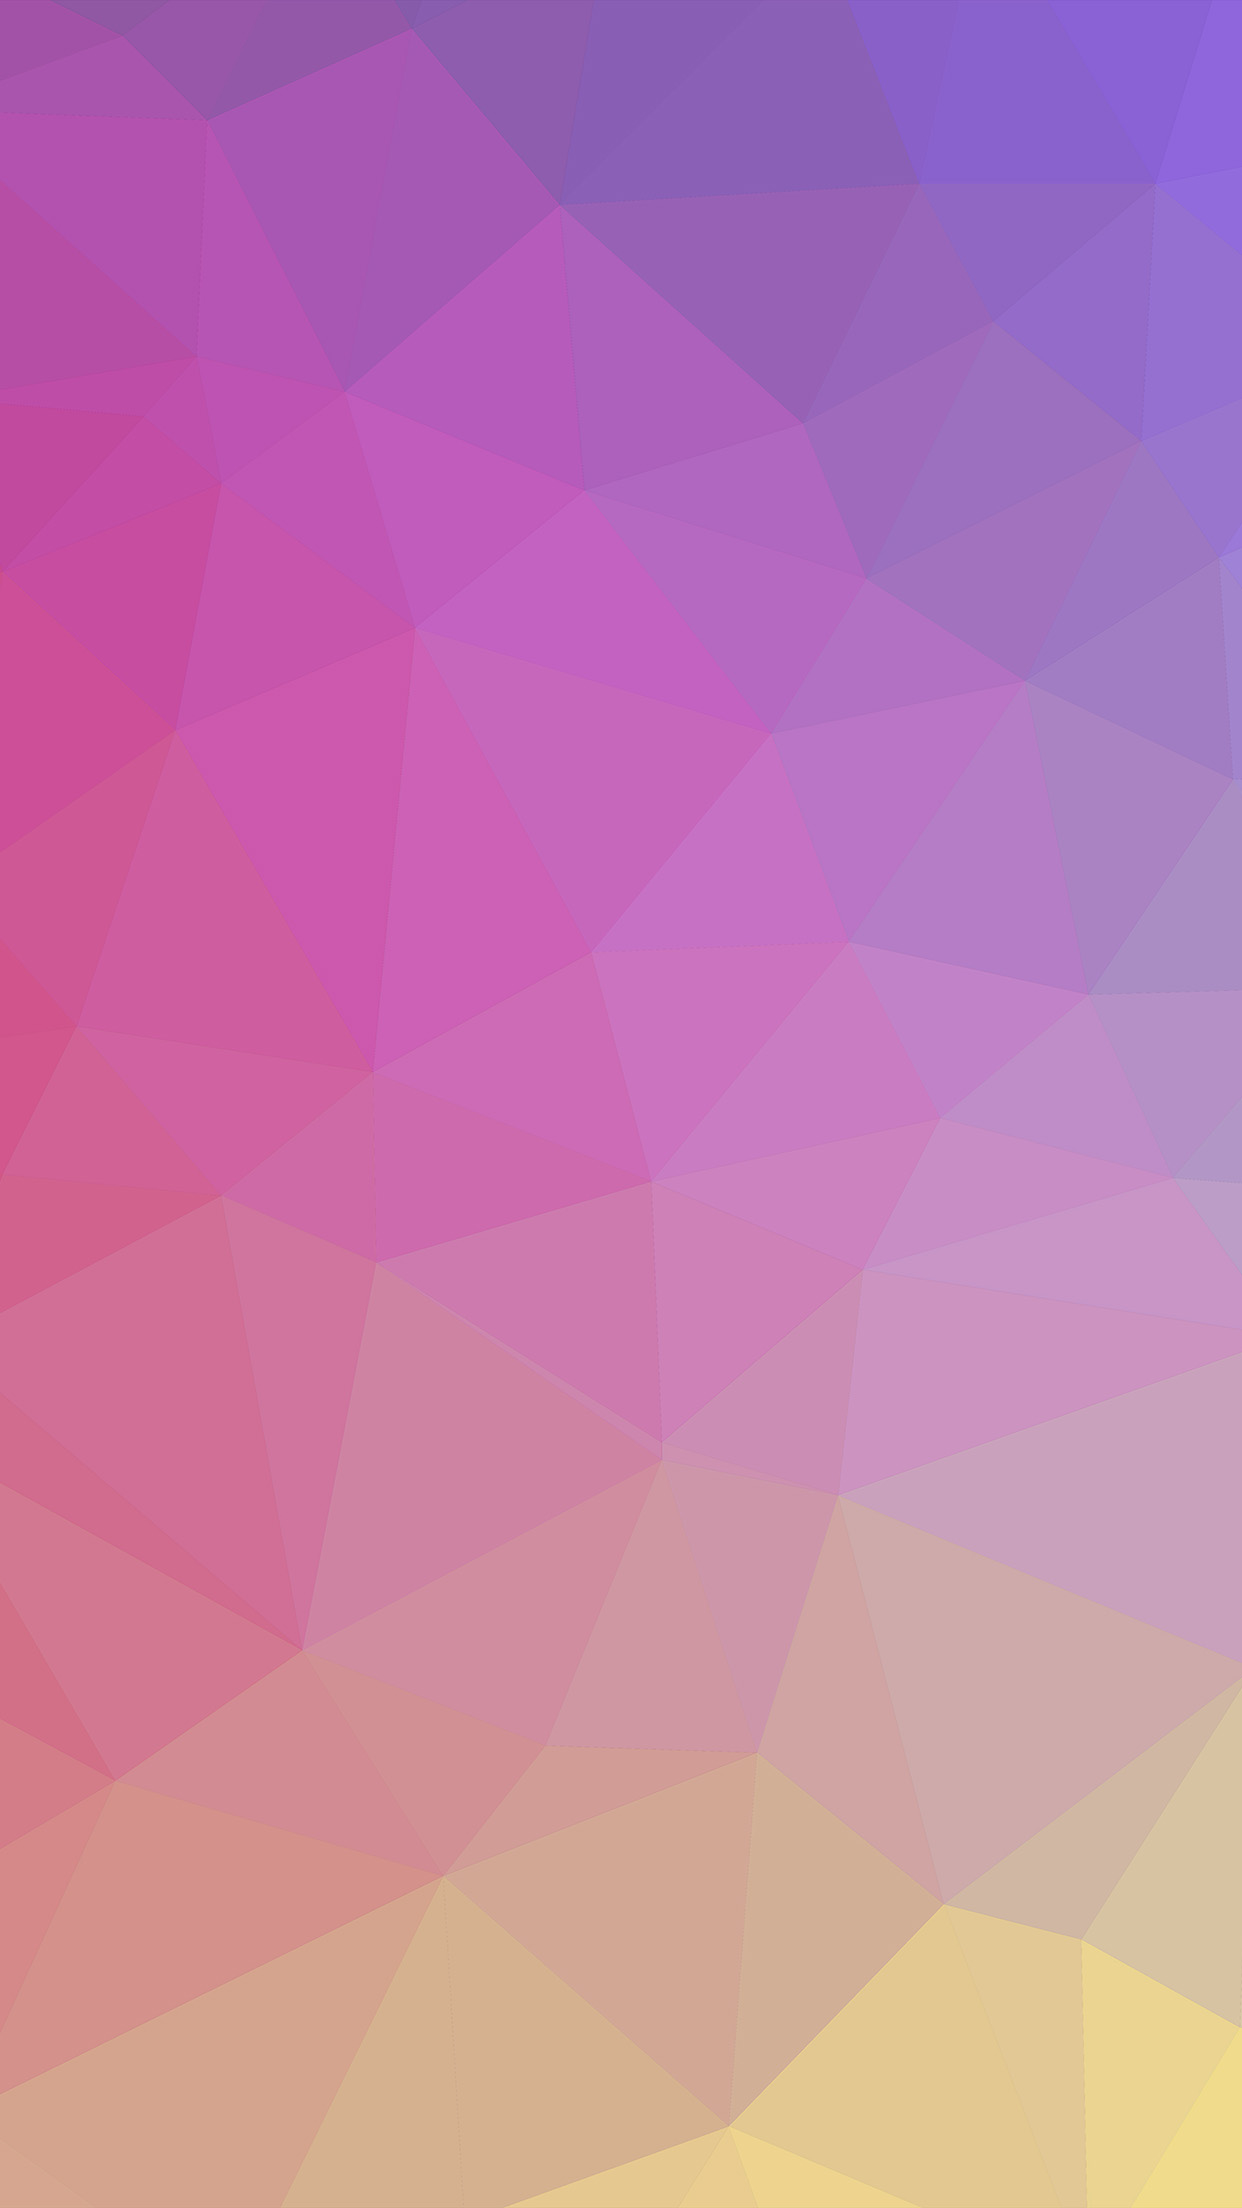 Note 8 3d Wallpaper Vk65 Samsung Galaxy Polyart Pastel Pink Yellow Pattern